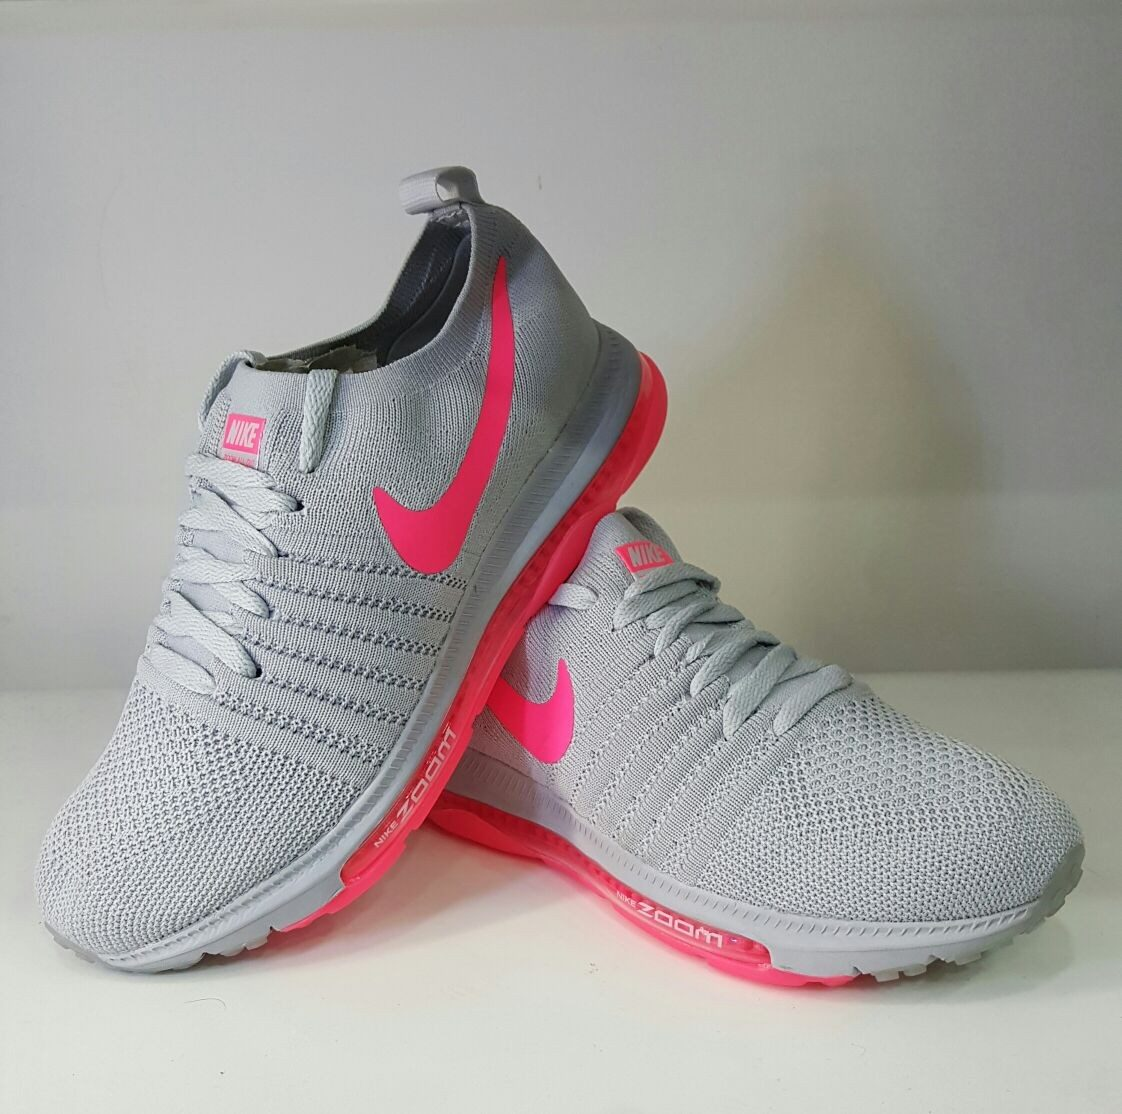 aee2d747e50c Tenis Tennis Nike Zoom All Out Hilo I De Dama -   175.500 en Mercado ...